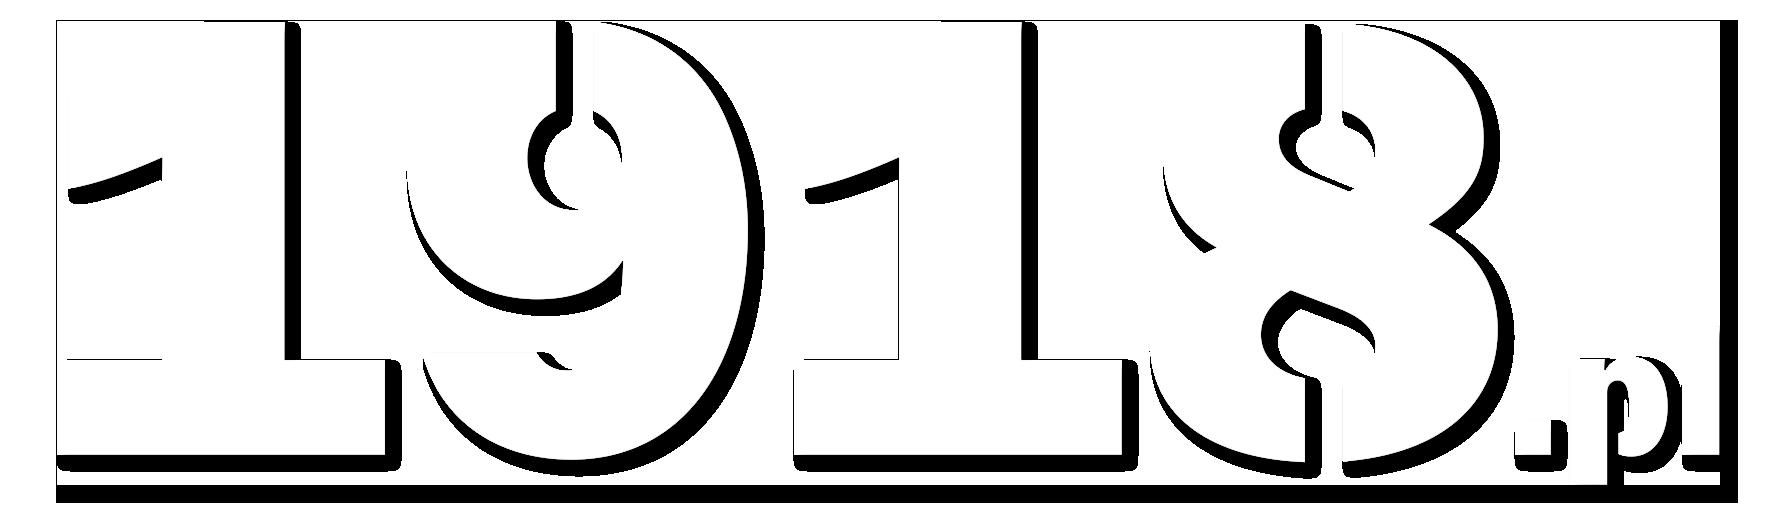 1918.pl